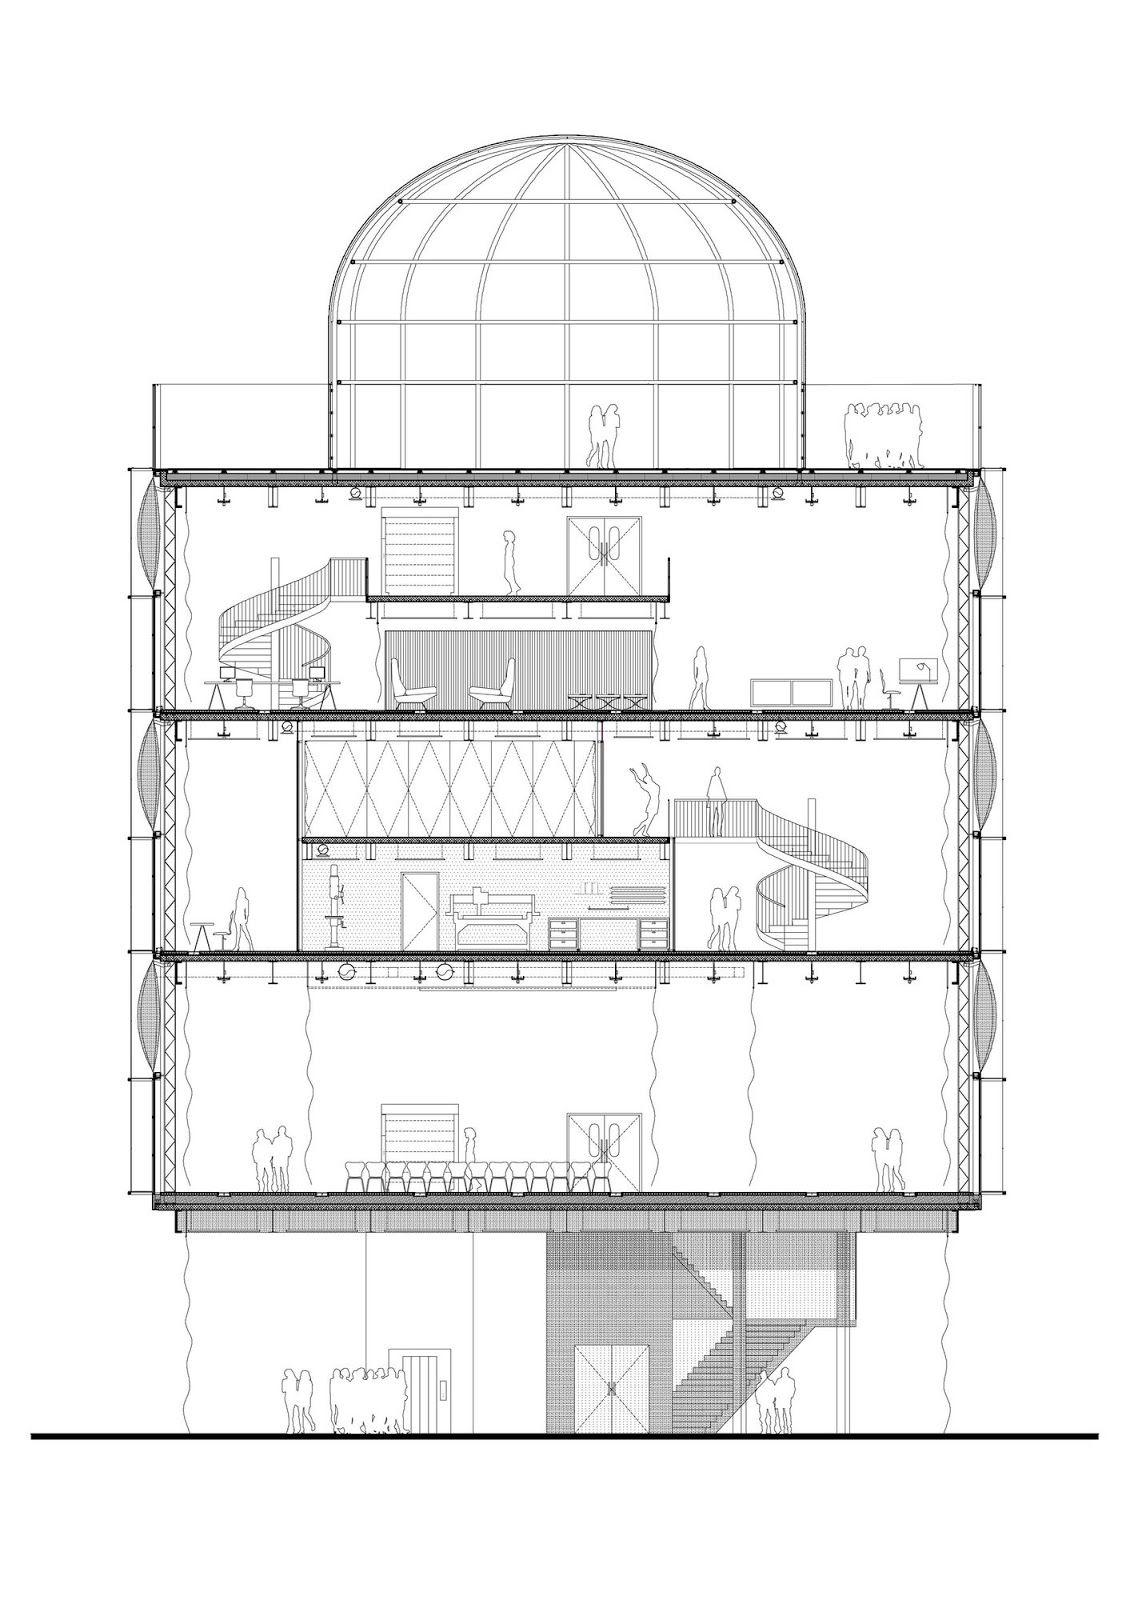 Cabinet D Architecte Caen bruther (avec images) | bruther architecture, maxime